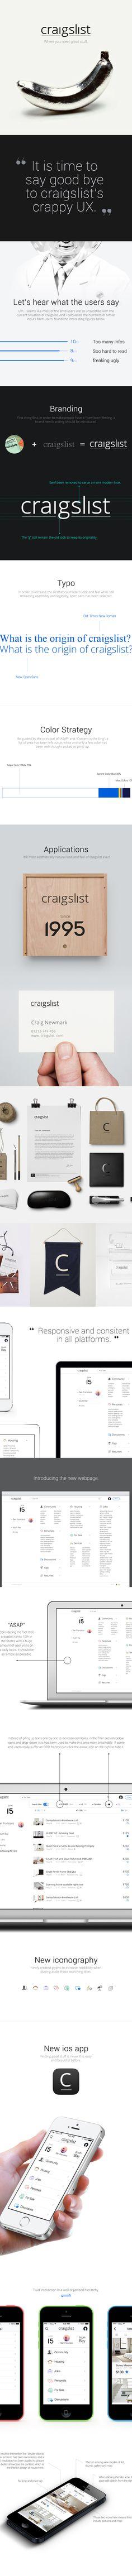 Craigslist Redesign on Behance